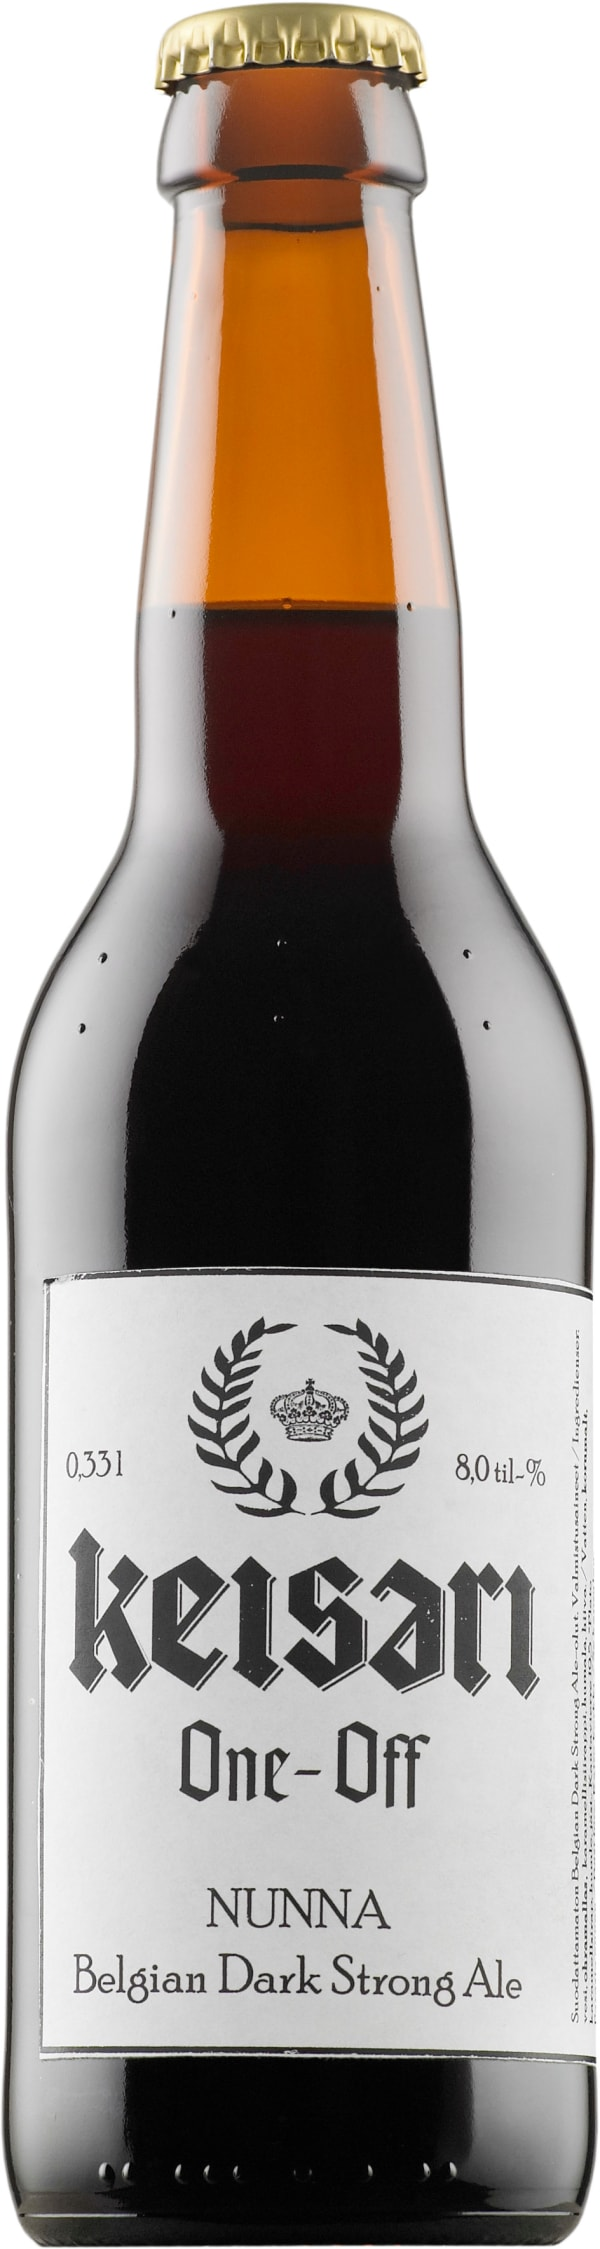 Keisari One-Off Nunna Belgian Dark Strong Ale